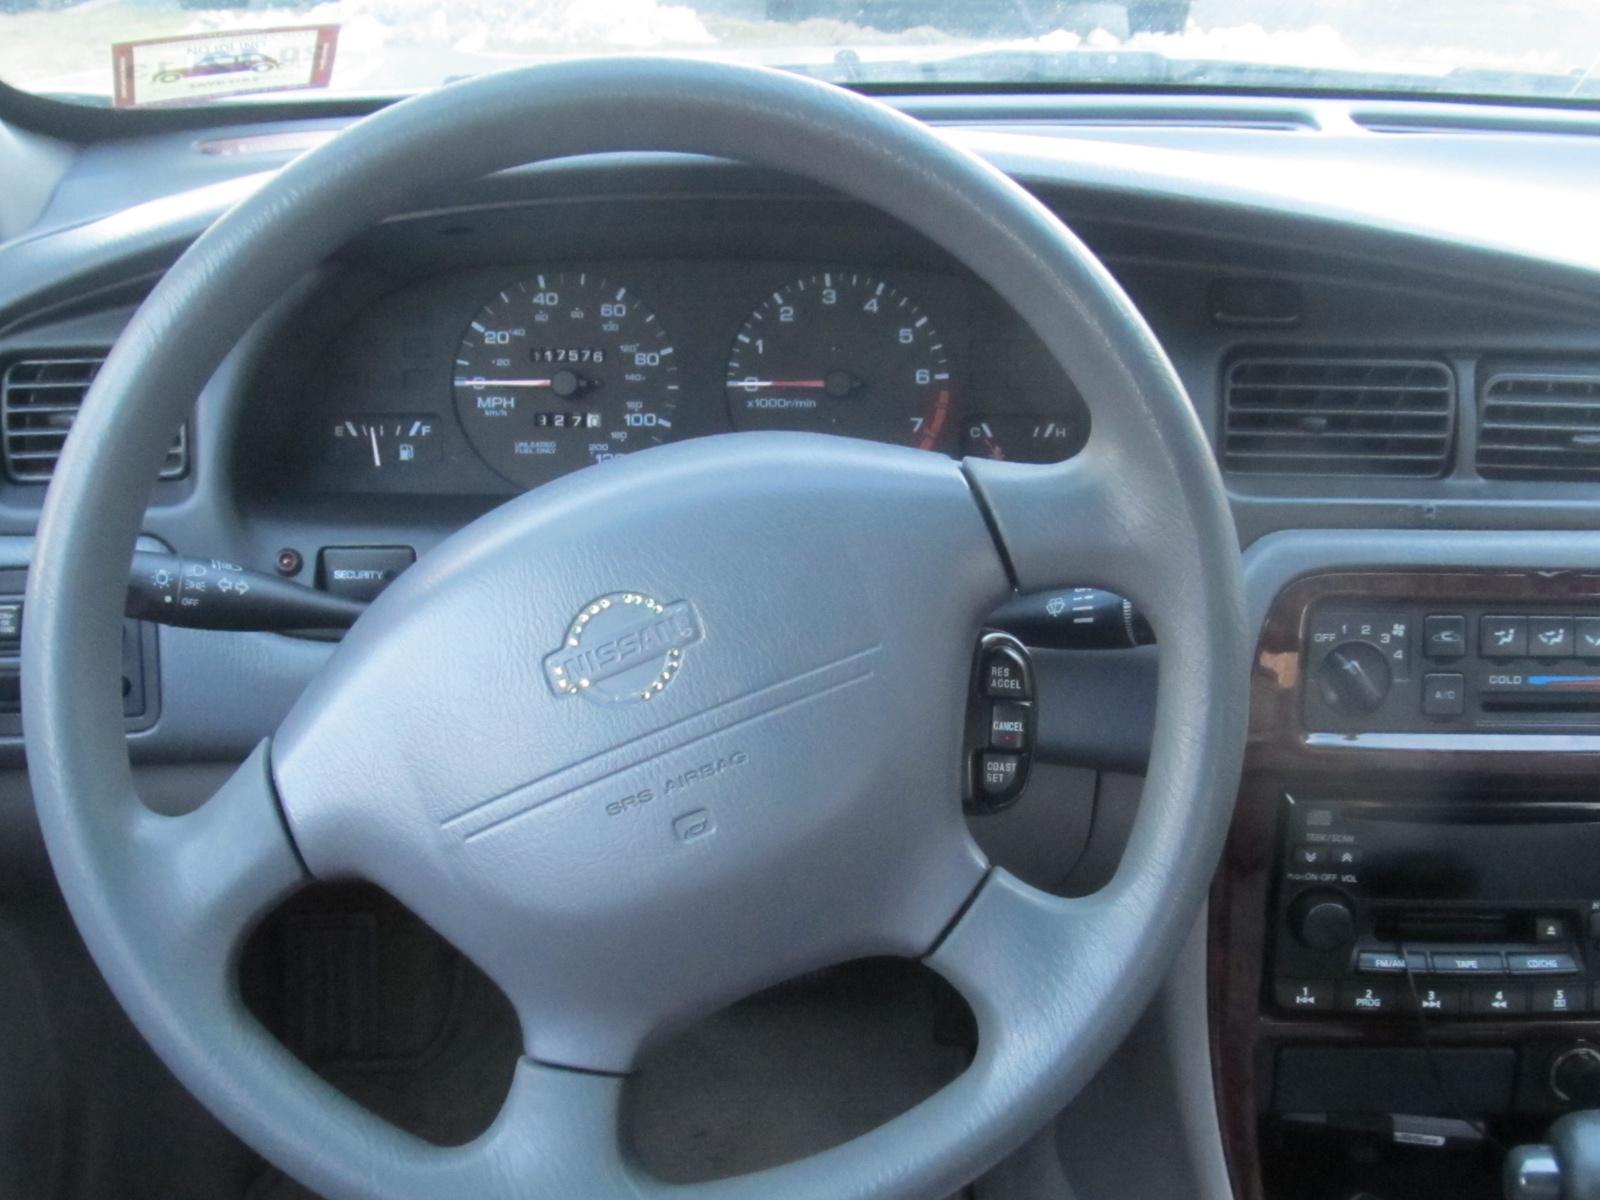 1999 nissan altima interior gxe cargurus cars